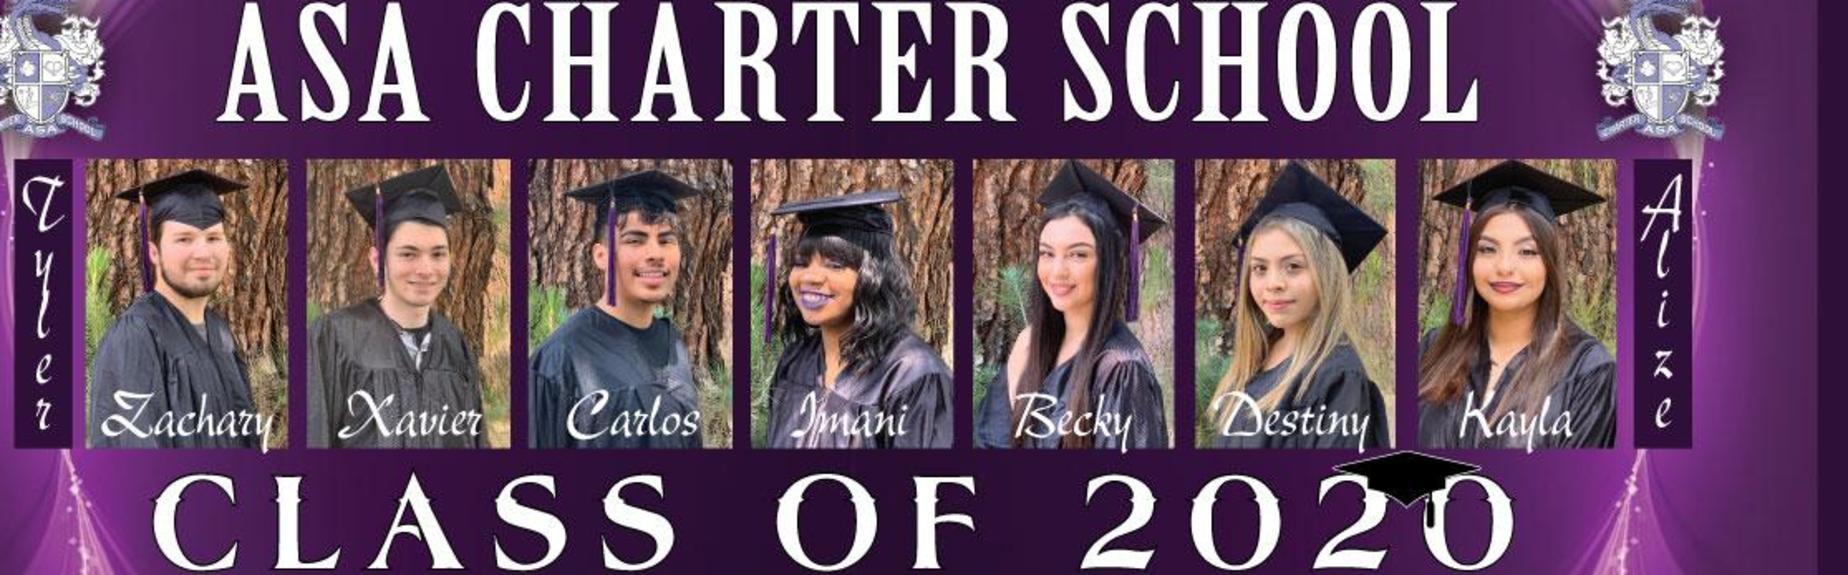 Graduates Class of 2020